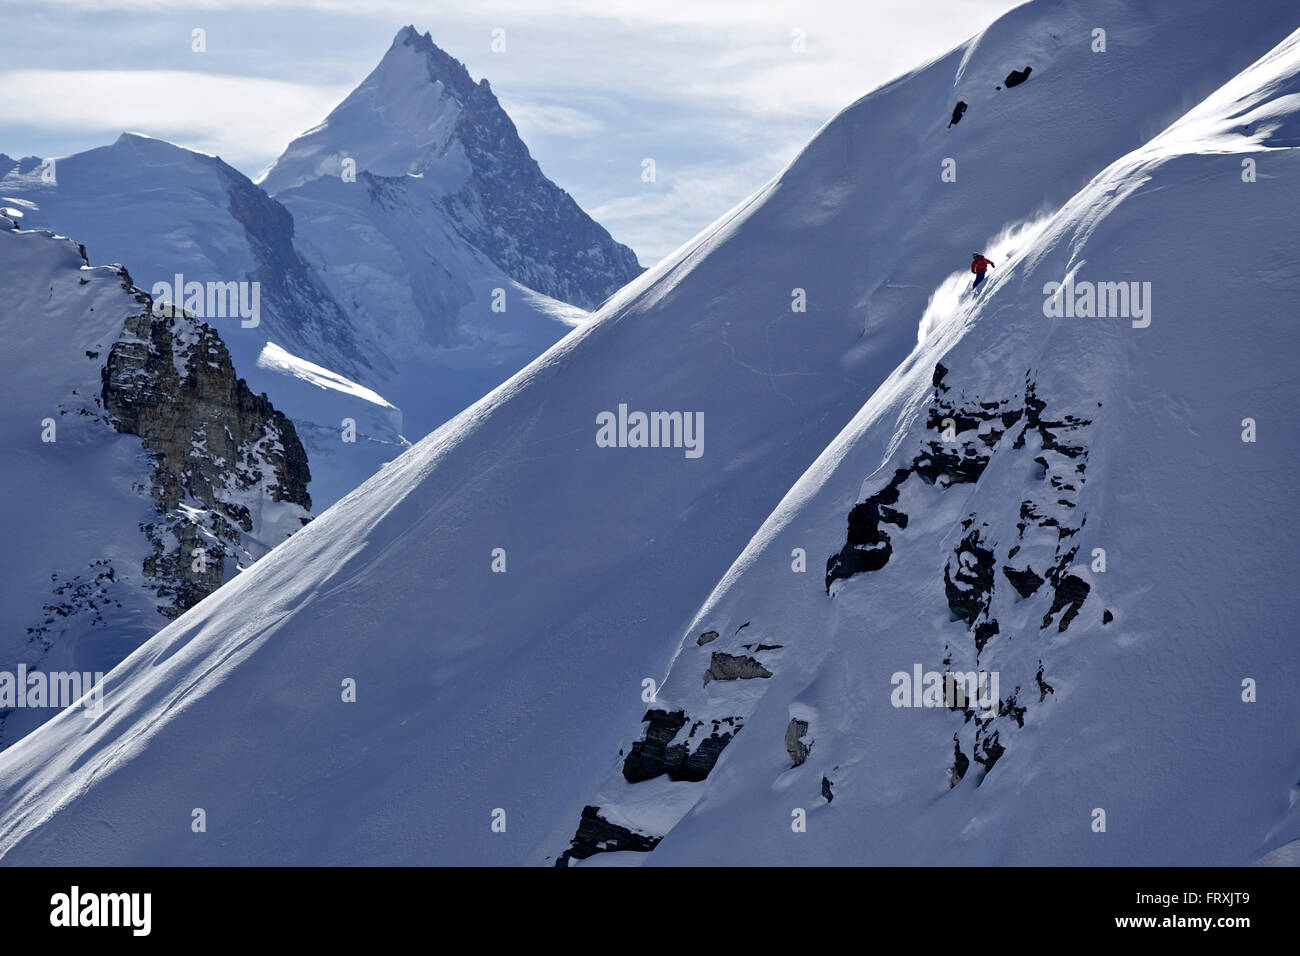 Freeskier downhill skiing in deep snow, Chandolin, Canton of Valais, Switzerland Stock Photo